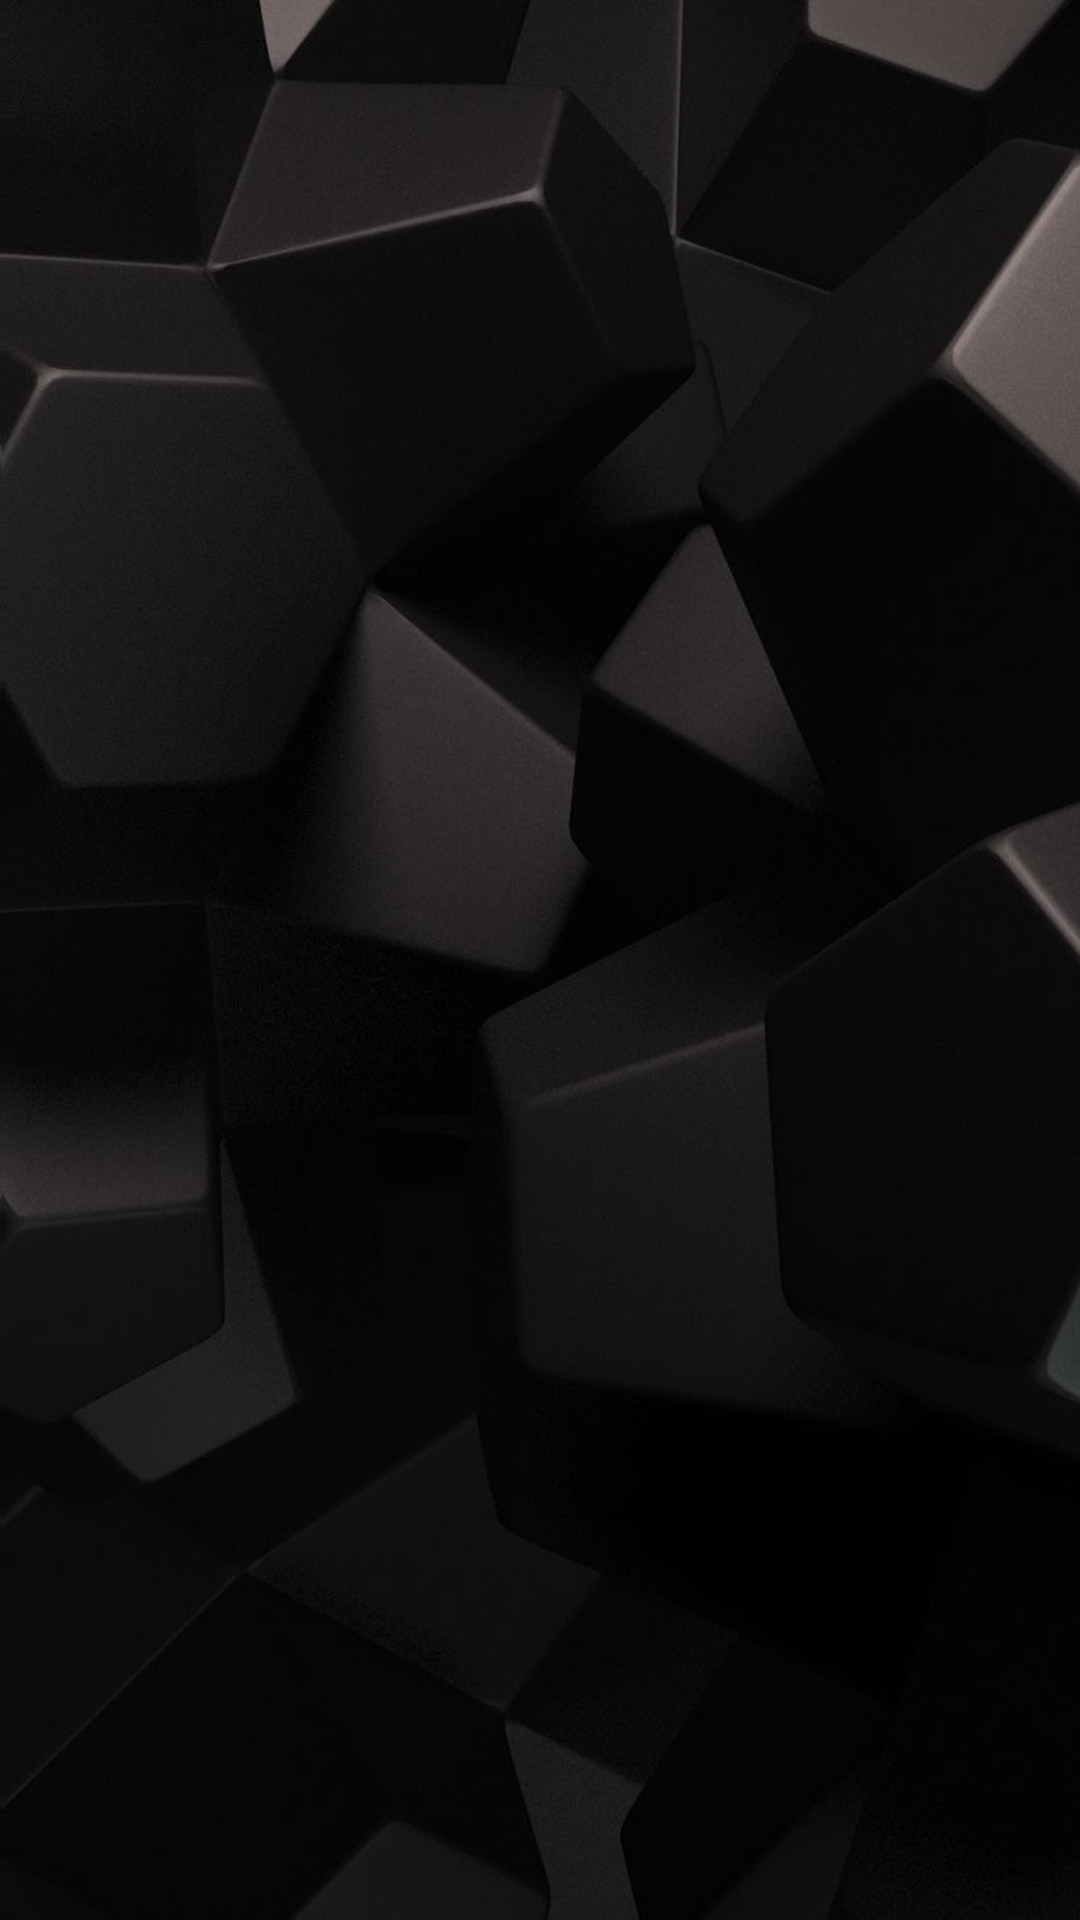 Black Mobile Wallpaper (66+ Images